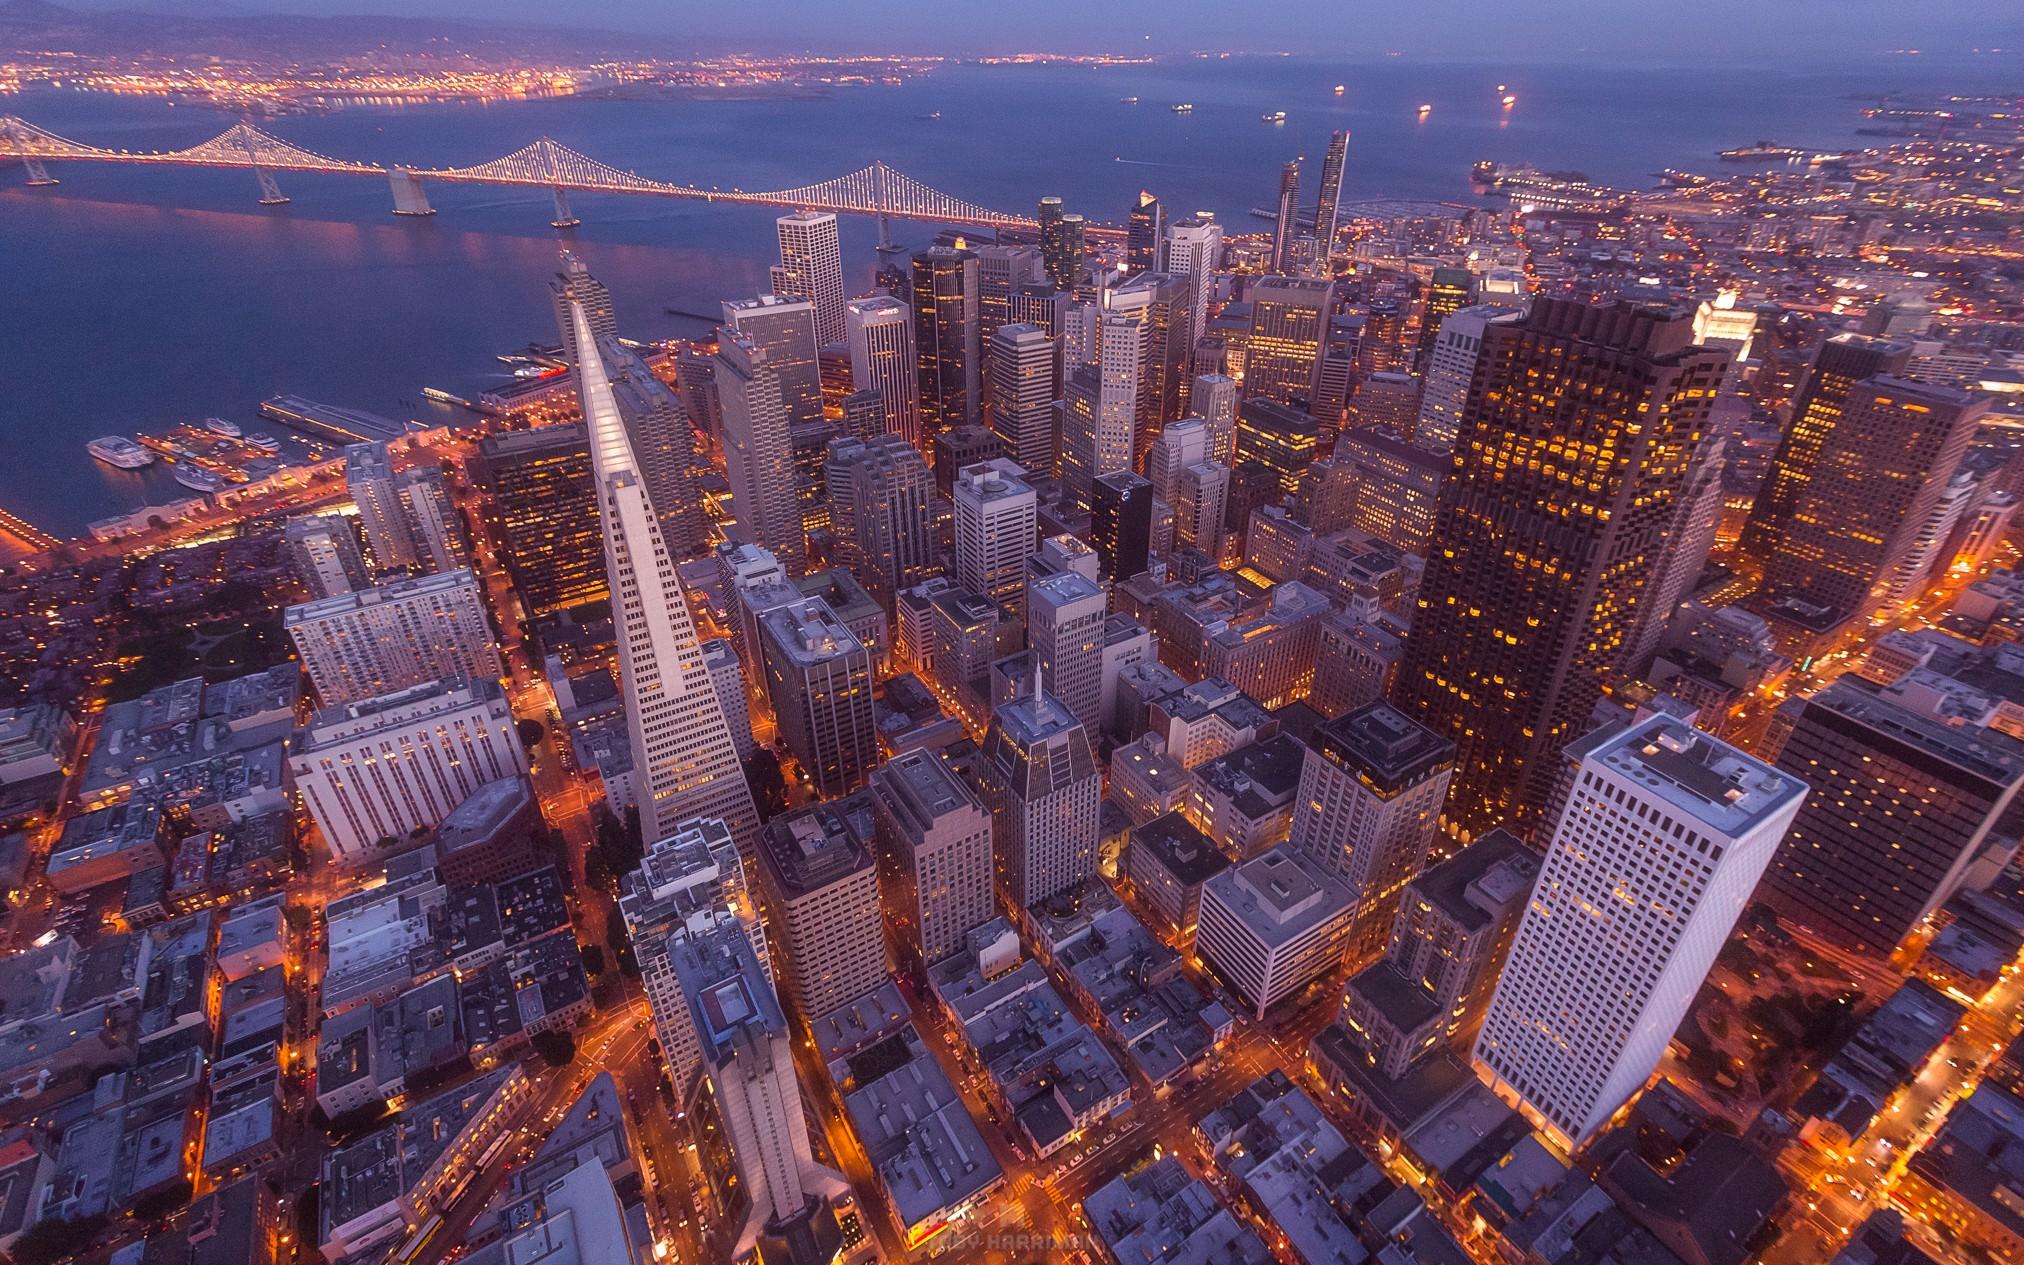 San Francisco, CA Aerial Photography - Toby Harriman